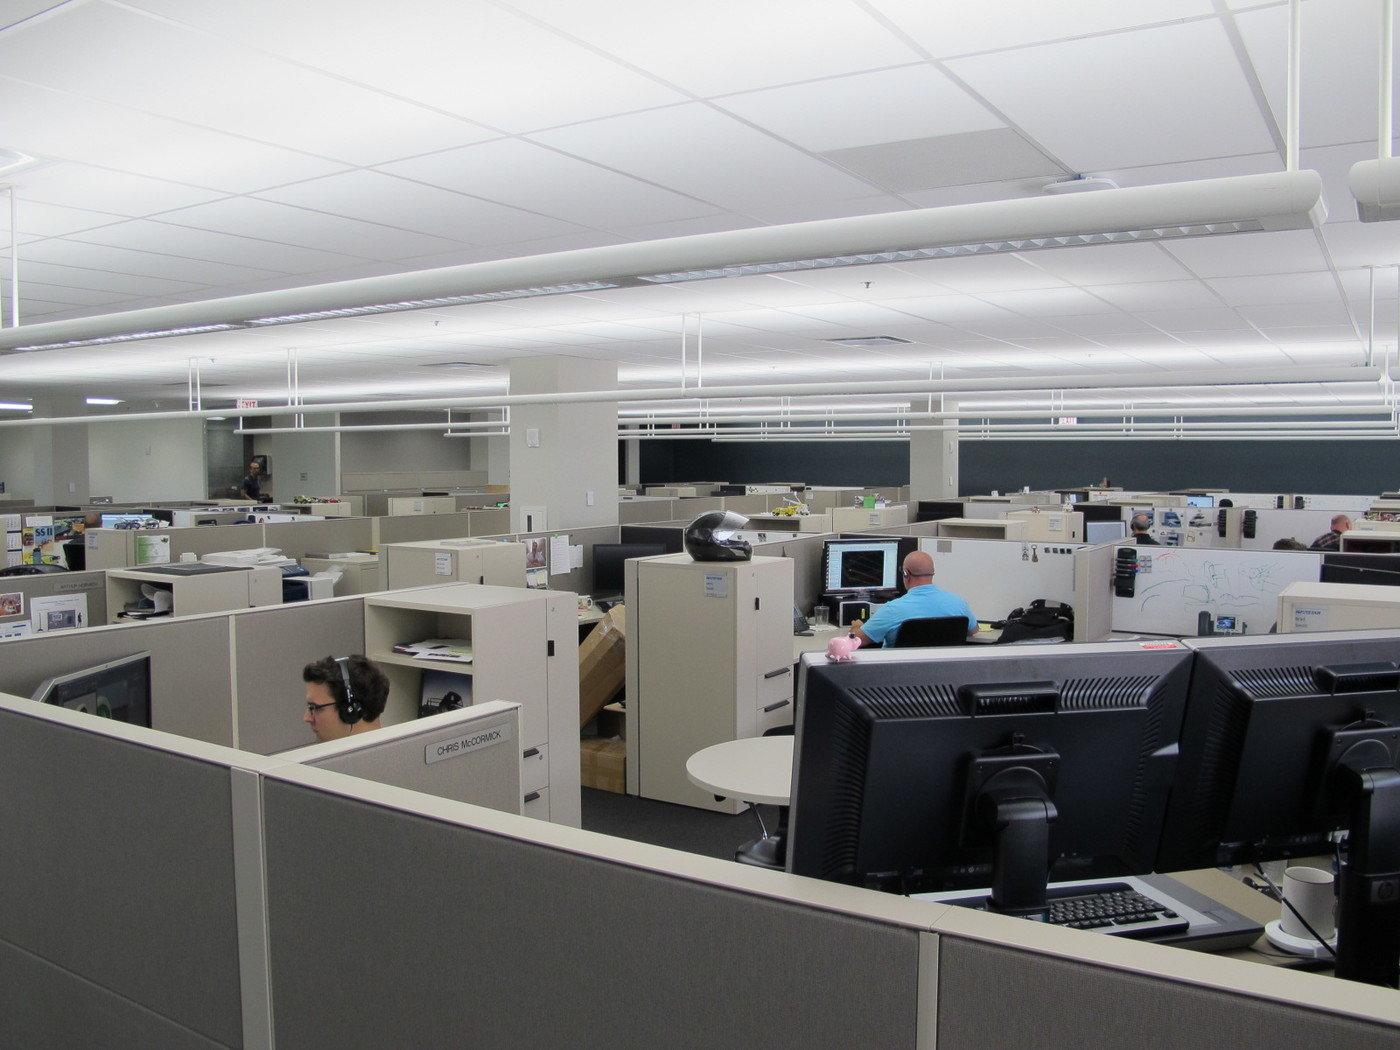 Navistar World-Center Industrial Design Facility by David Allendorph